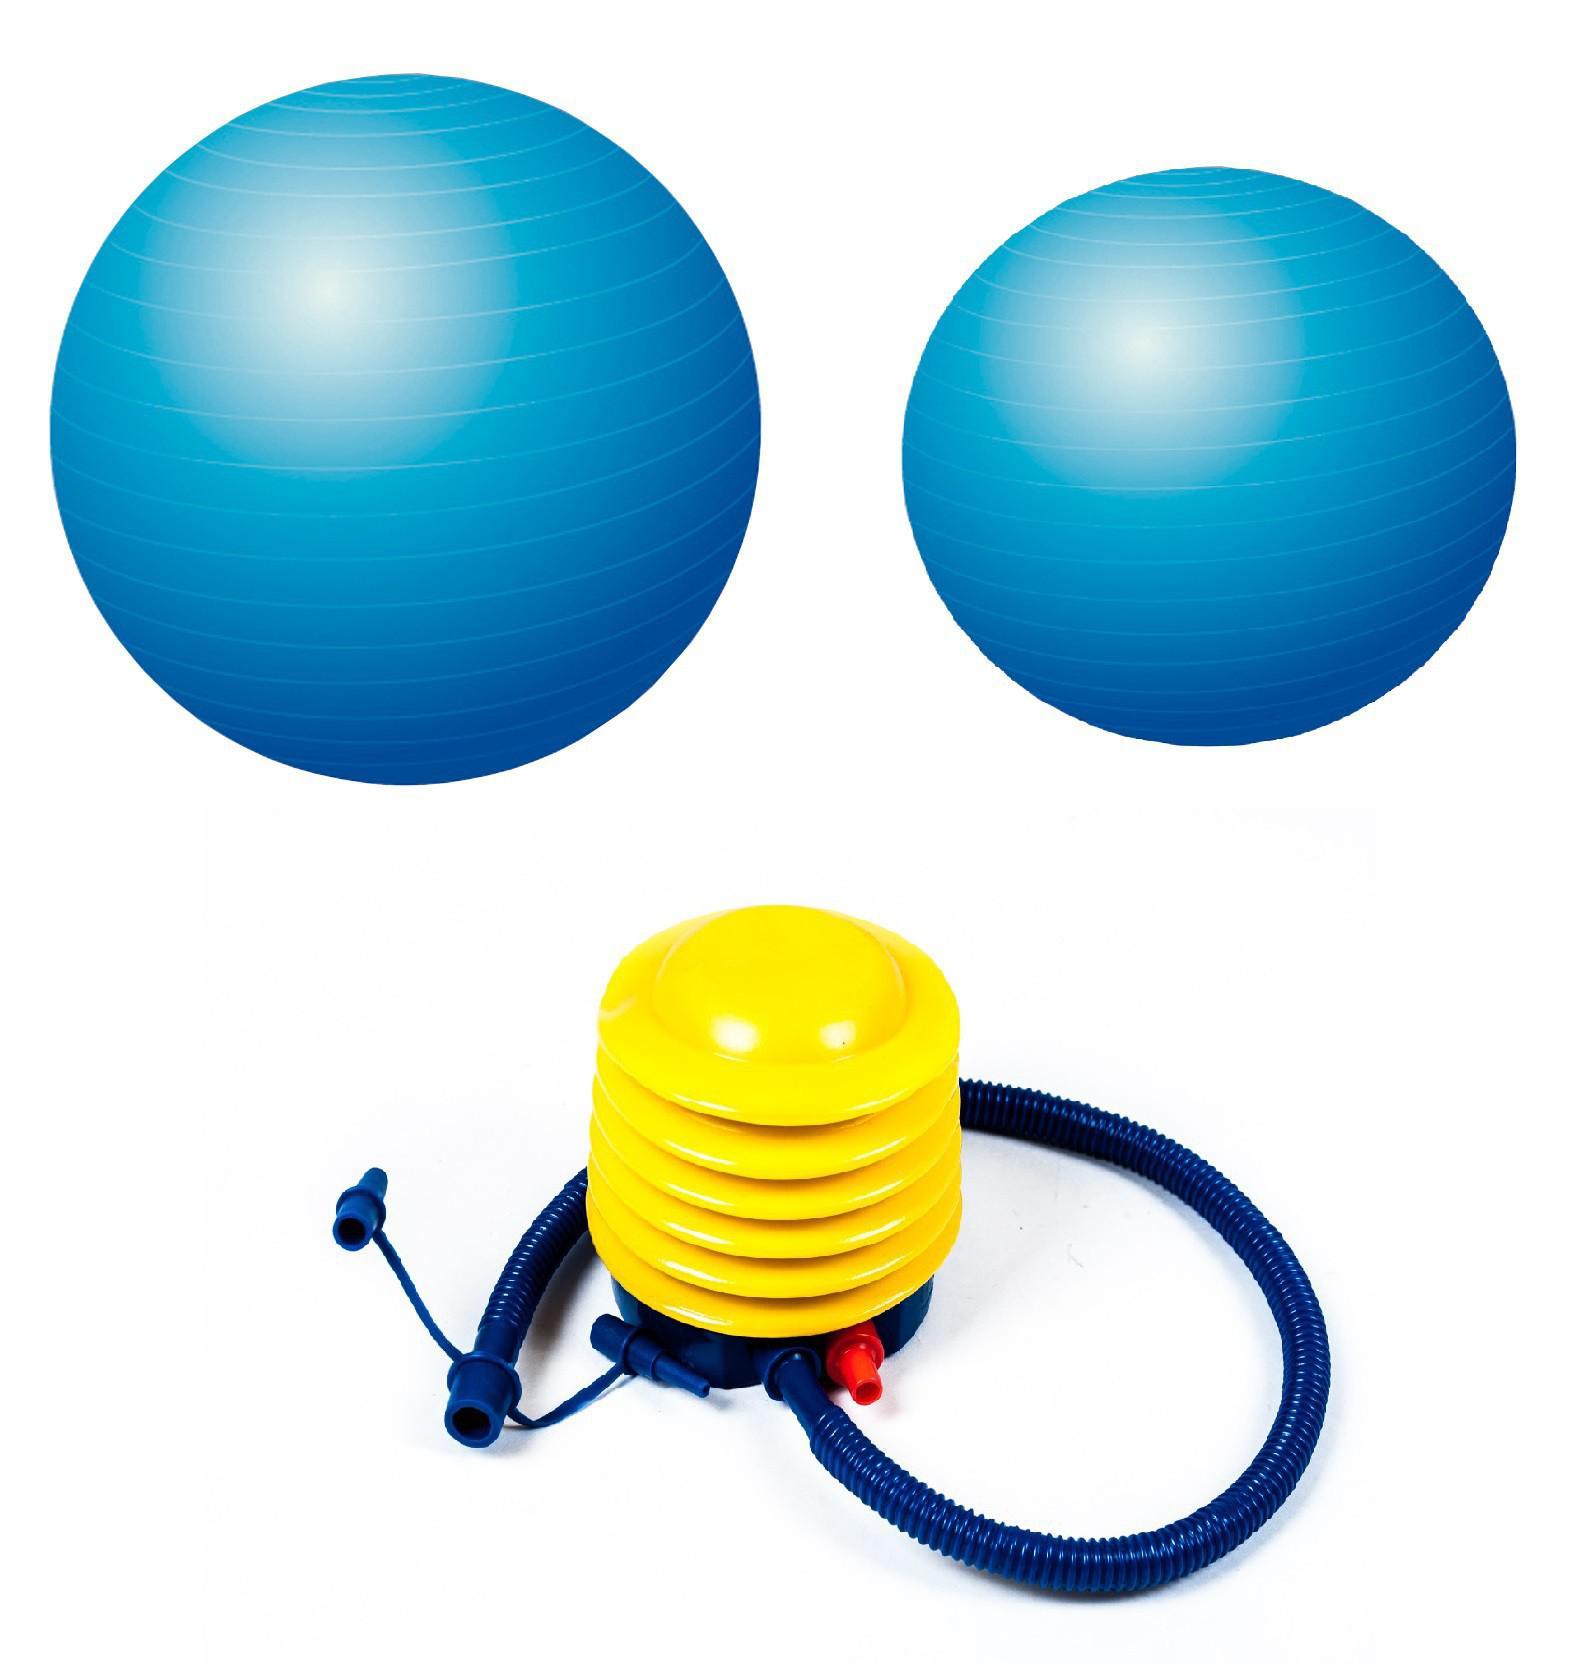 ball luftpumpe beautiful stcke sport aufblasen nadel pin. Black Bedroom Furniture Sets. Home Design Ideas